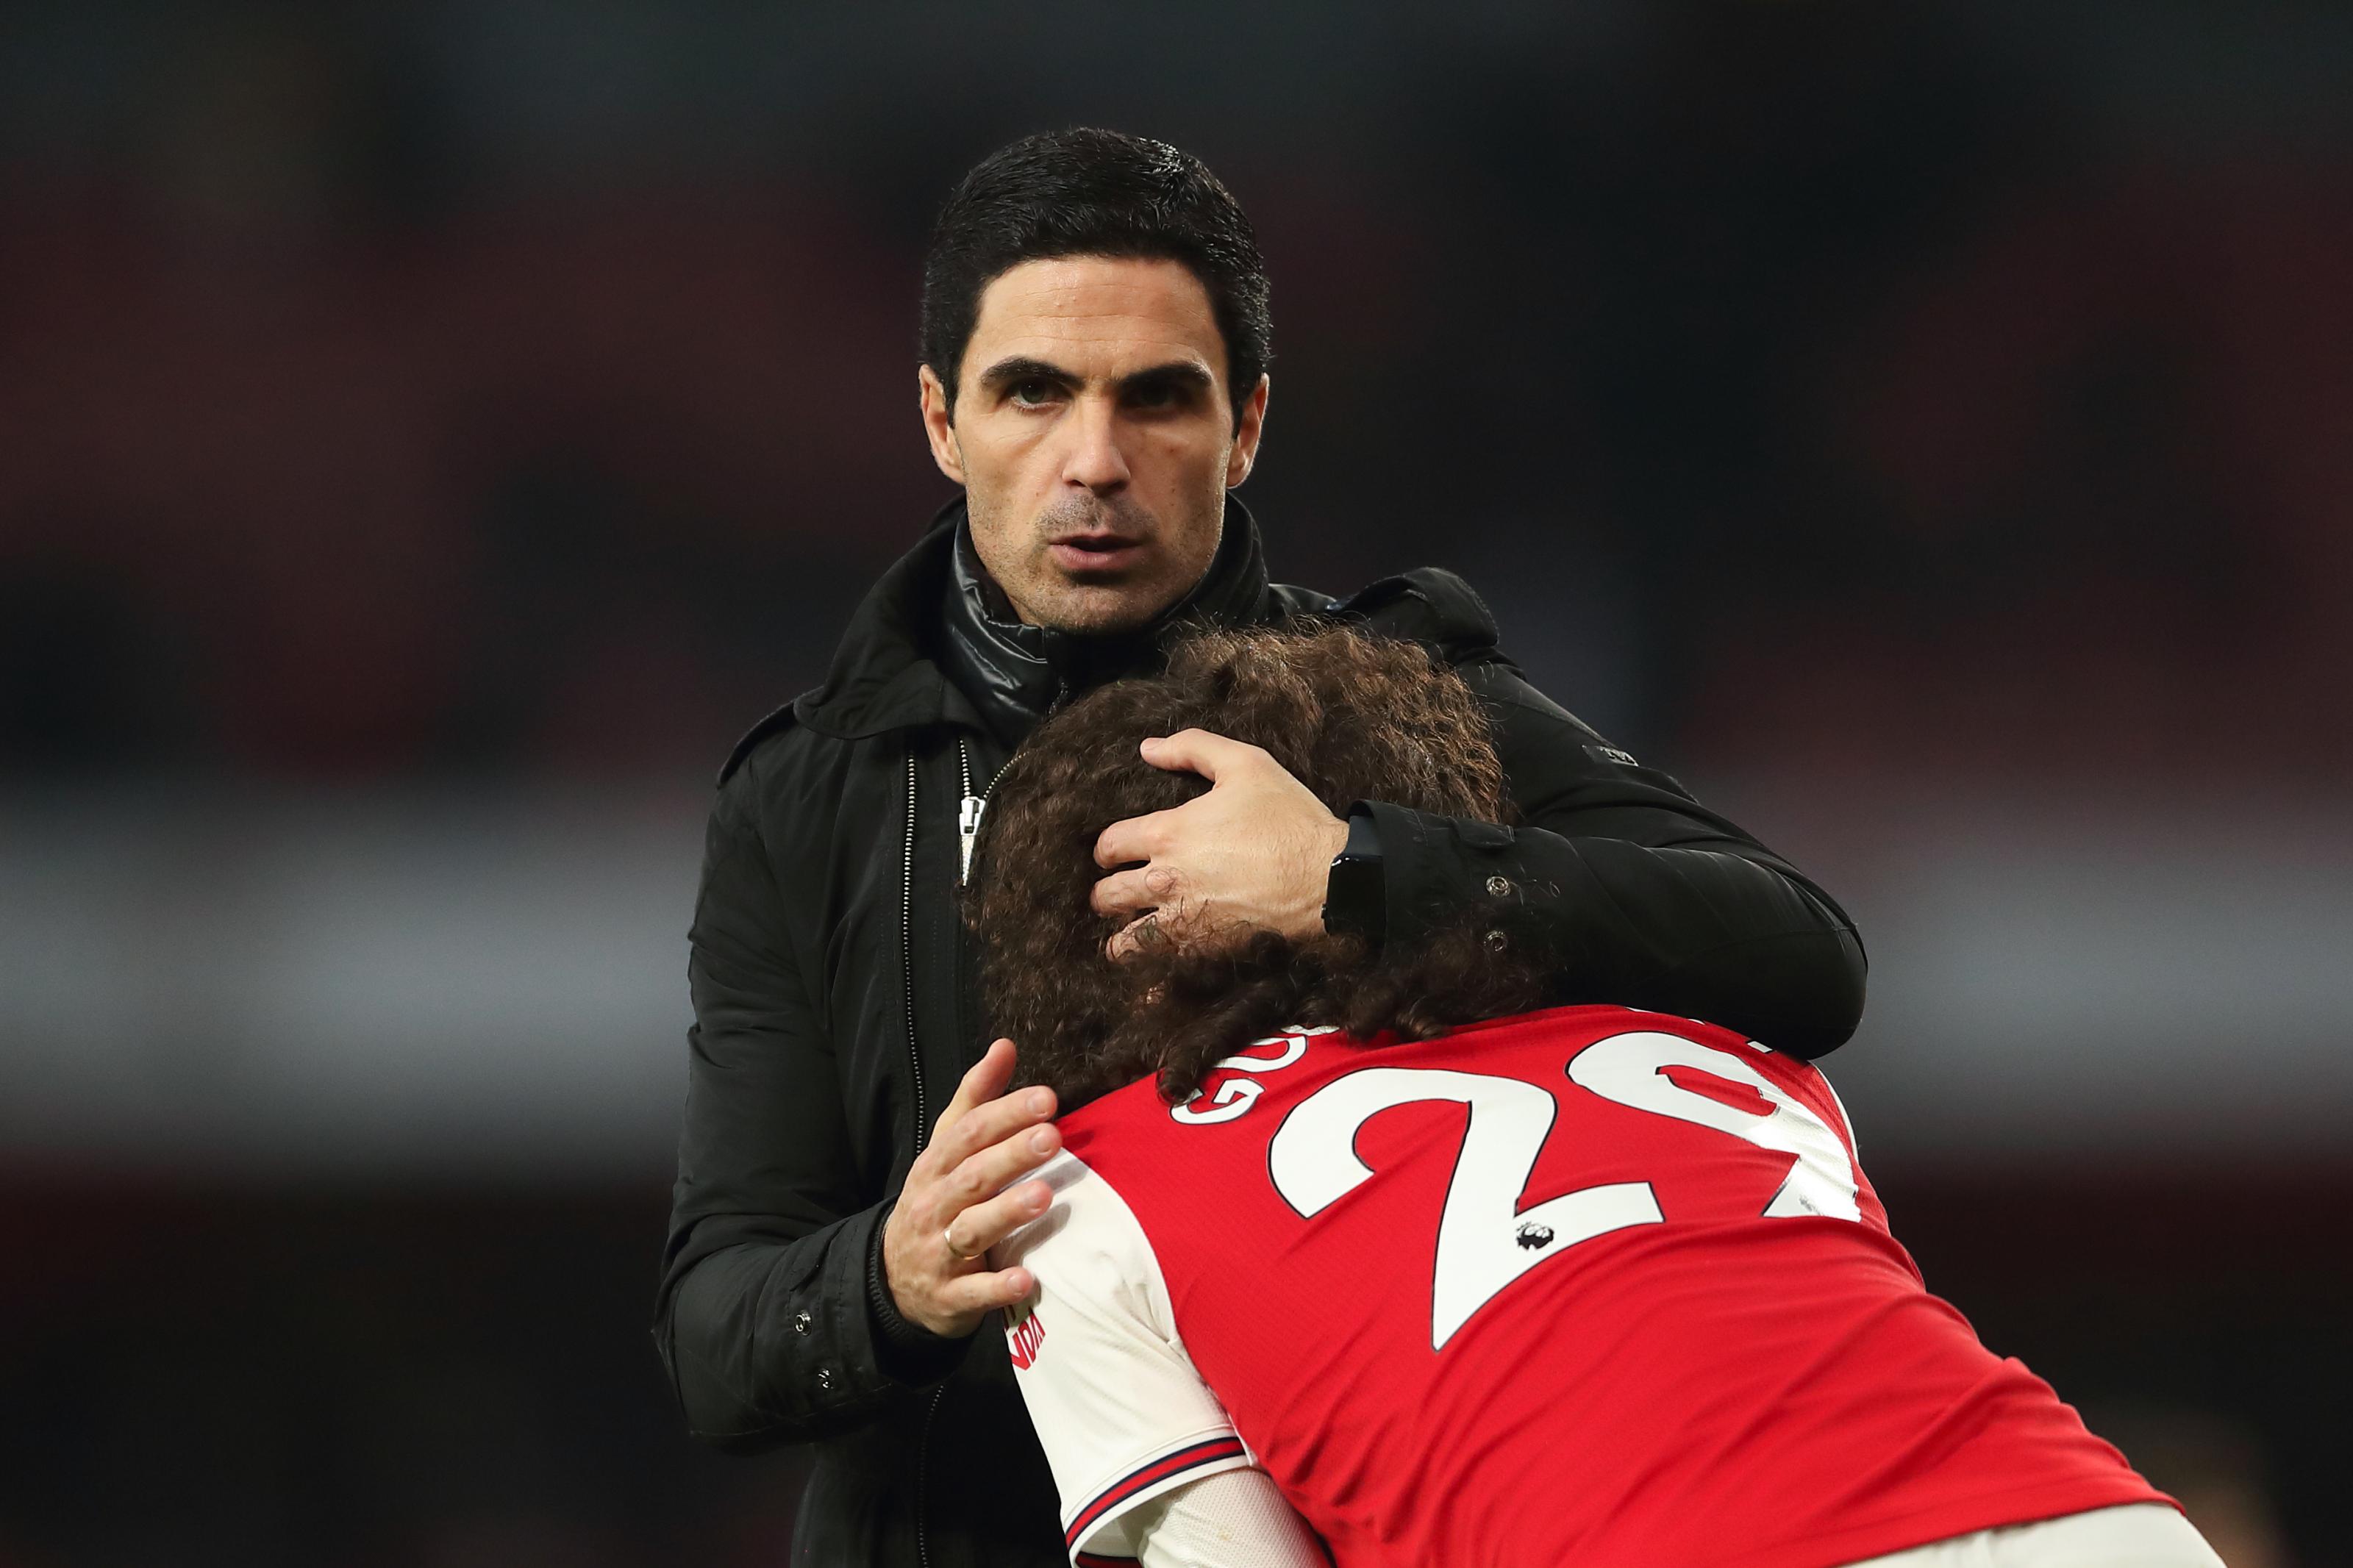 Arsenal: Only one winner in Mikel Arteta vs. Matteo Guendouzi battle